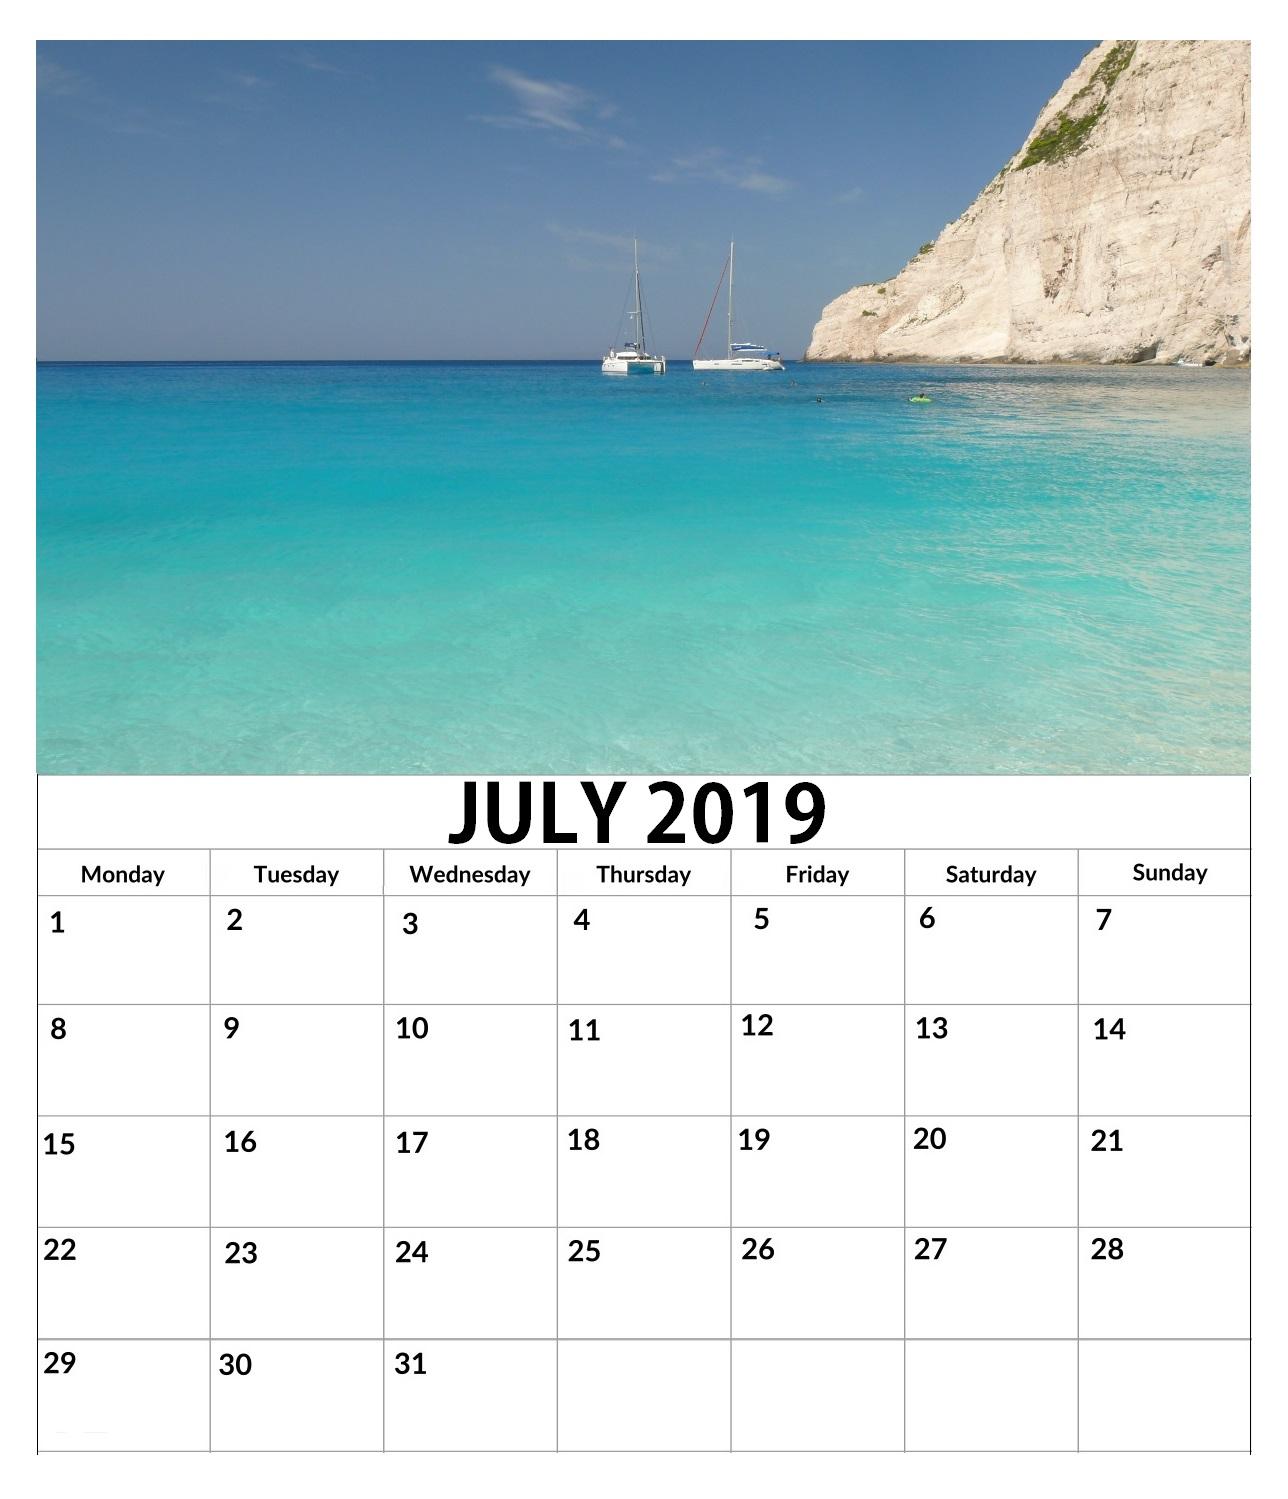 July 2019 Wall Calendar To Print